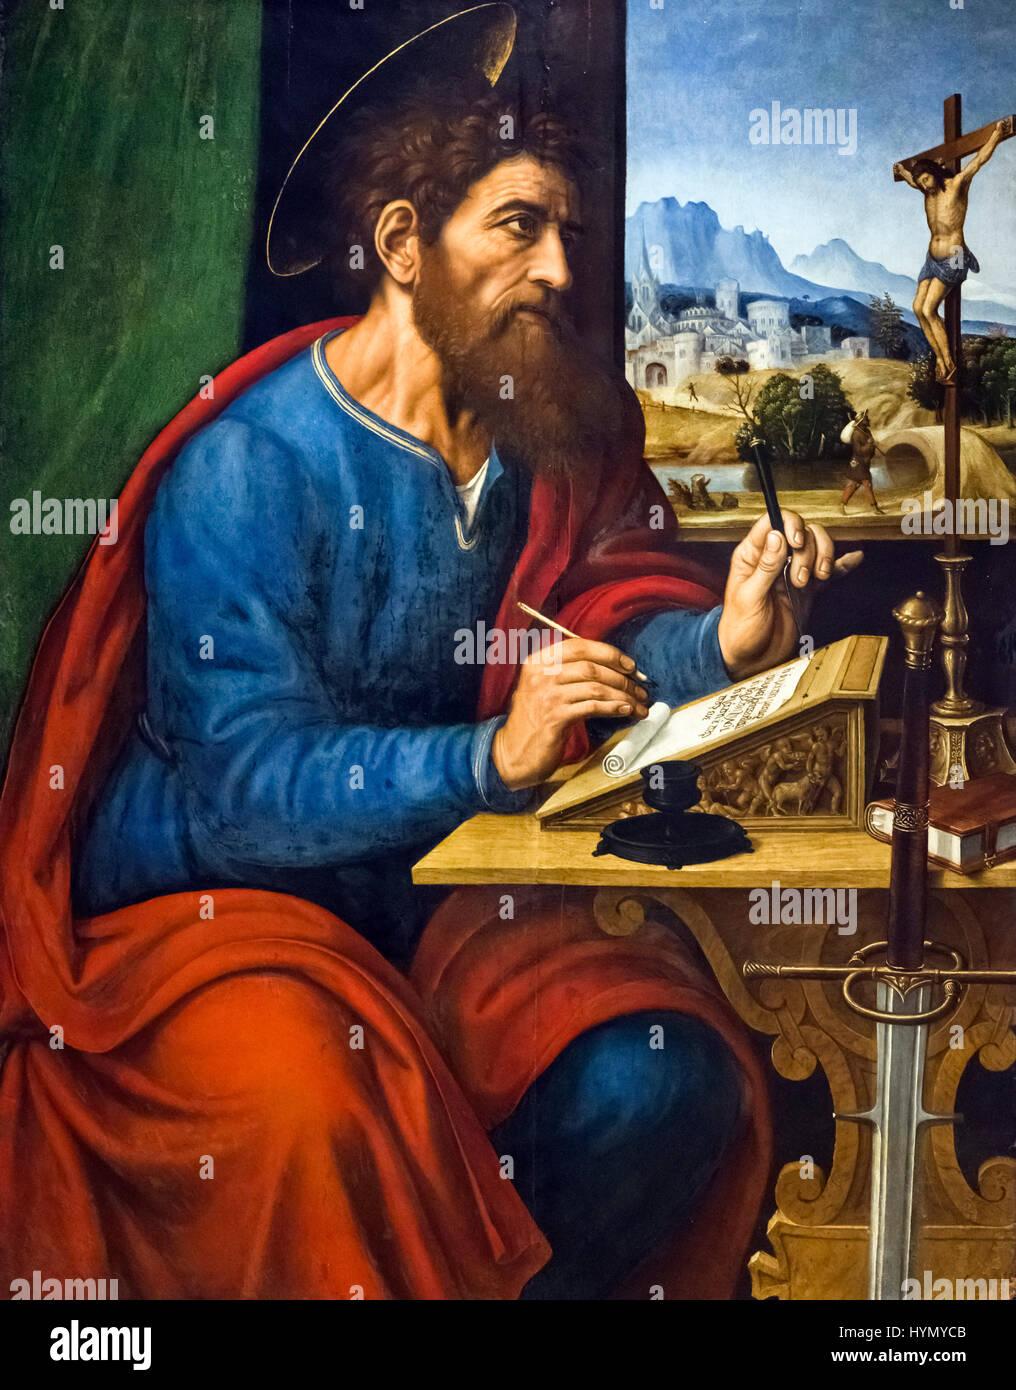 Saint Paul schreiben von Pier Francesco Sacchi (1485-1528), Öl auf Pappelholz, 1520 s Stockbild